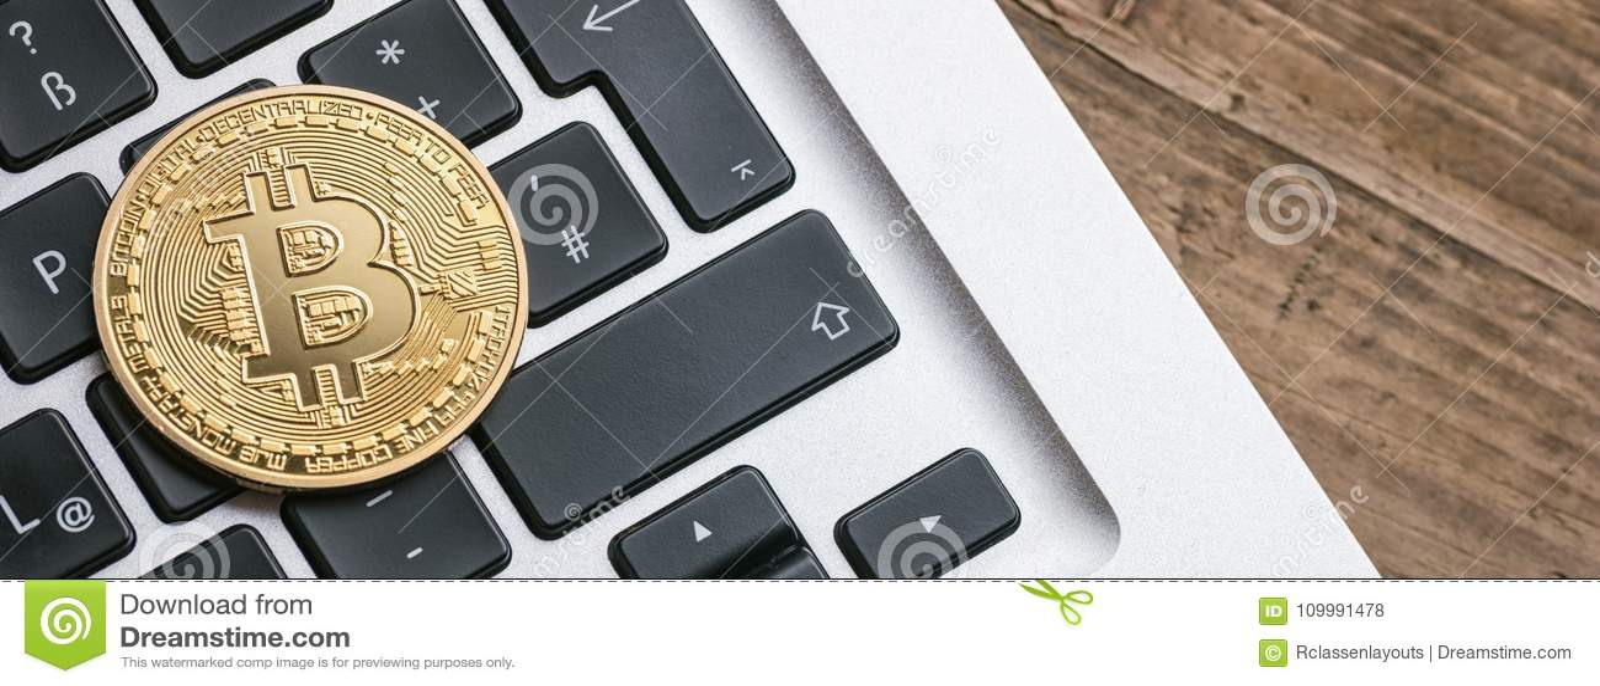 Cryptocurrency Bitcoin цифров на тетради